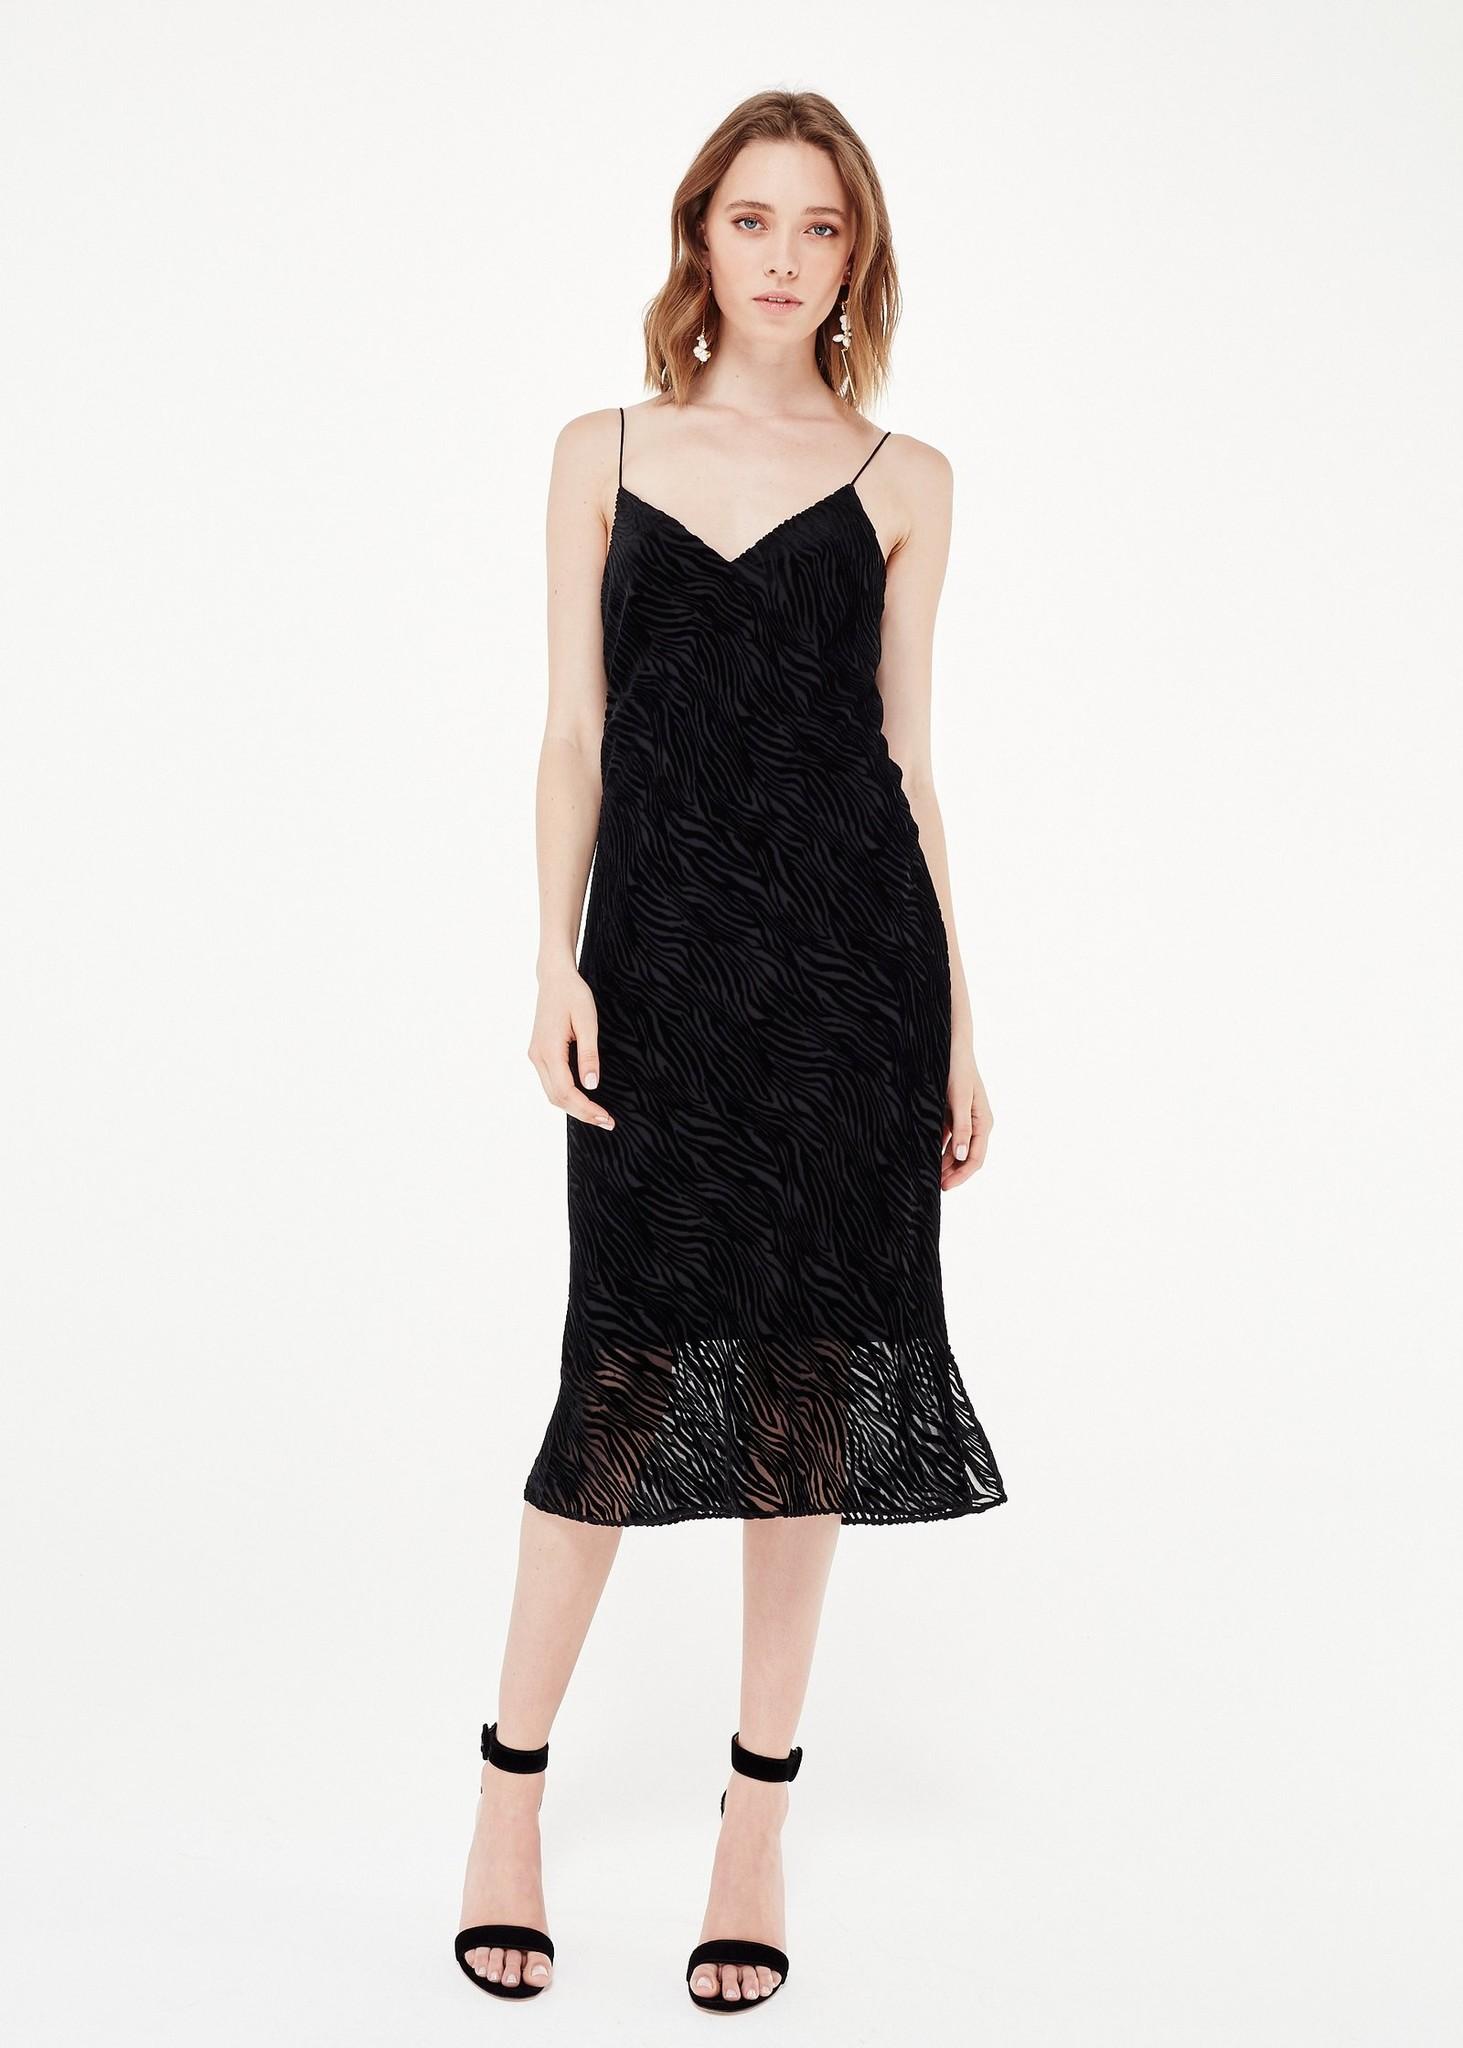 Cami NYC The Raven Burnout Dress